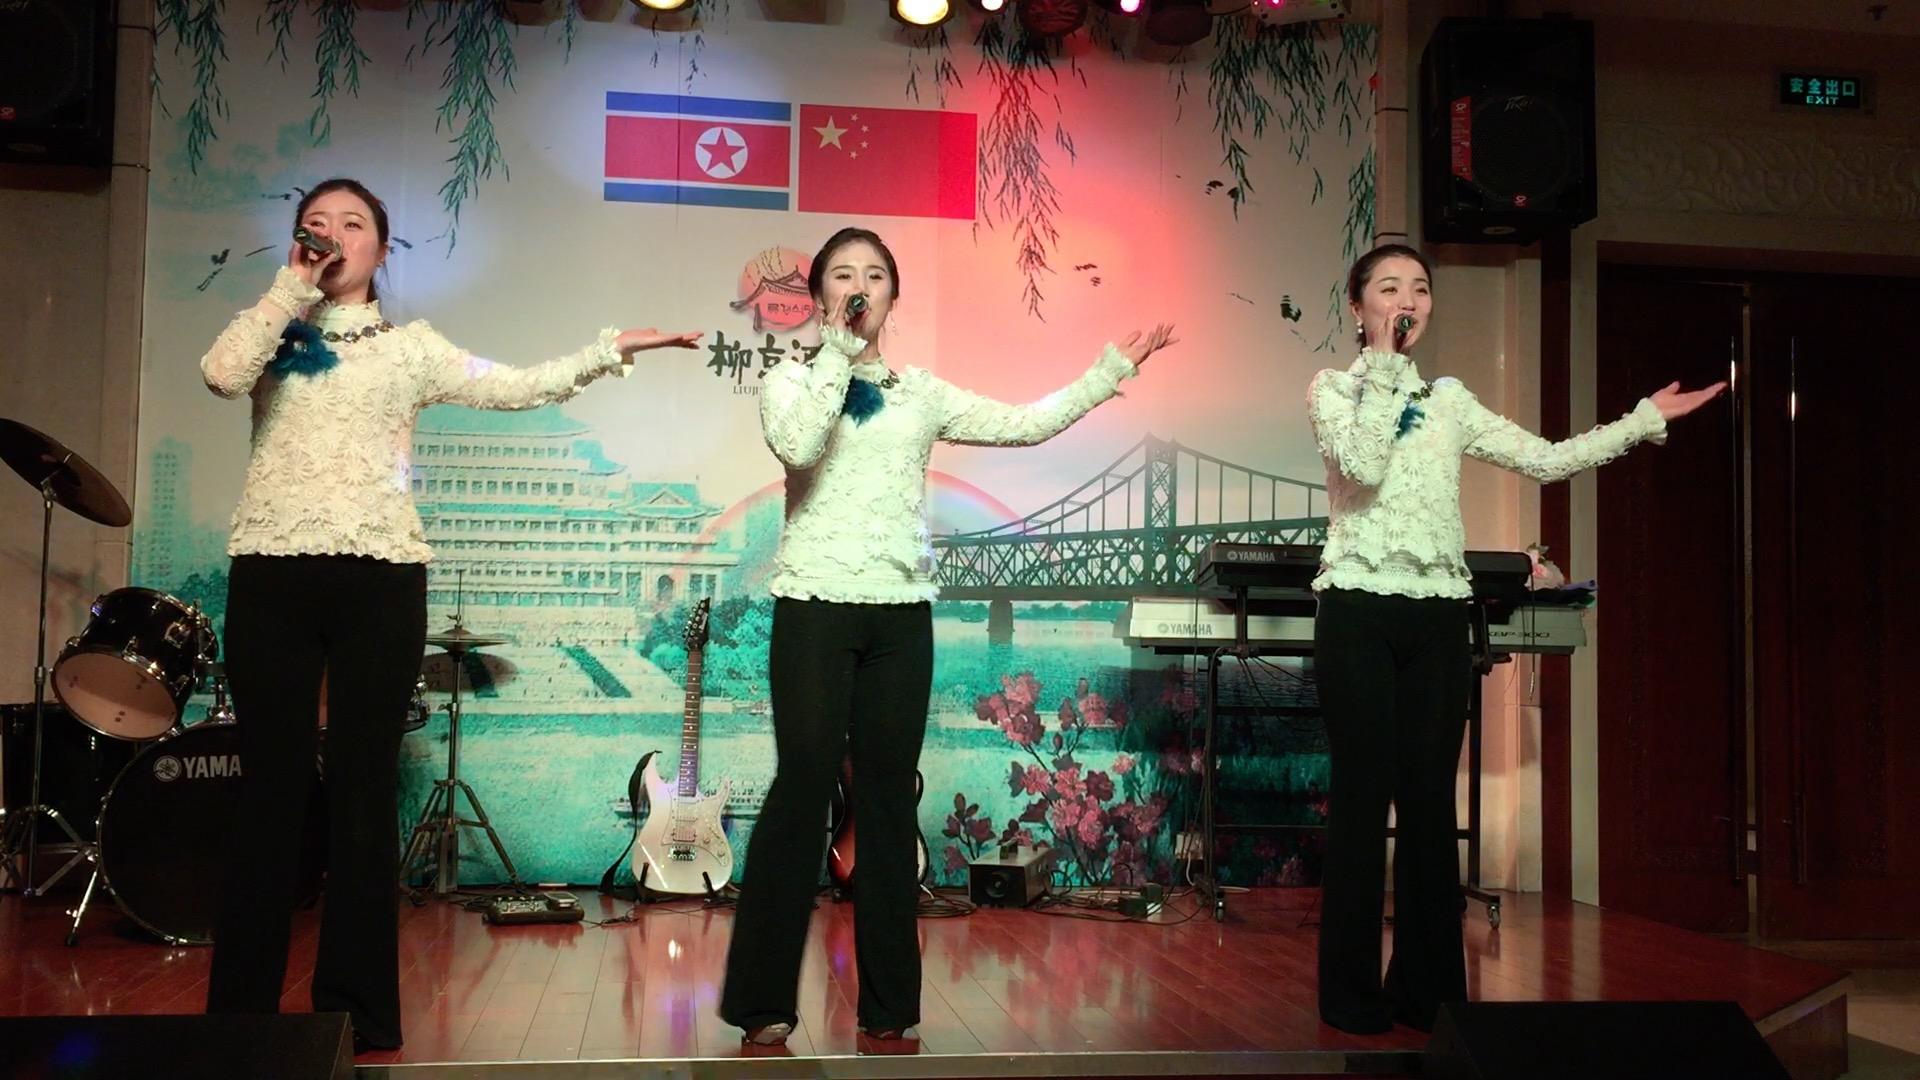 North Korean restaurant workers defect en masse to South Korea